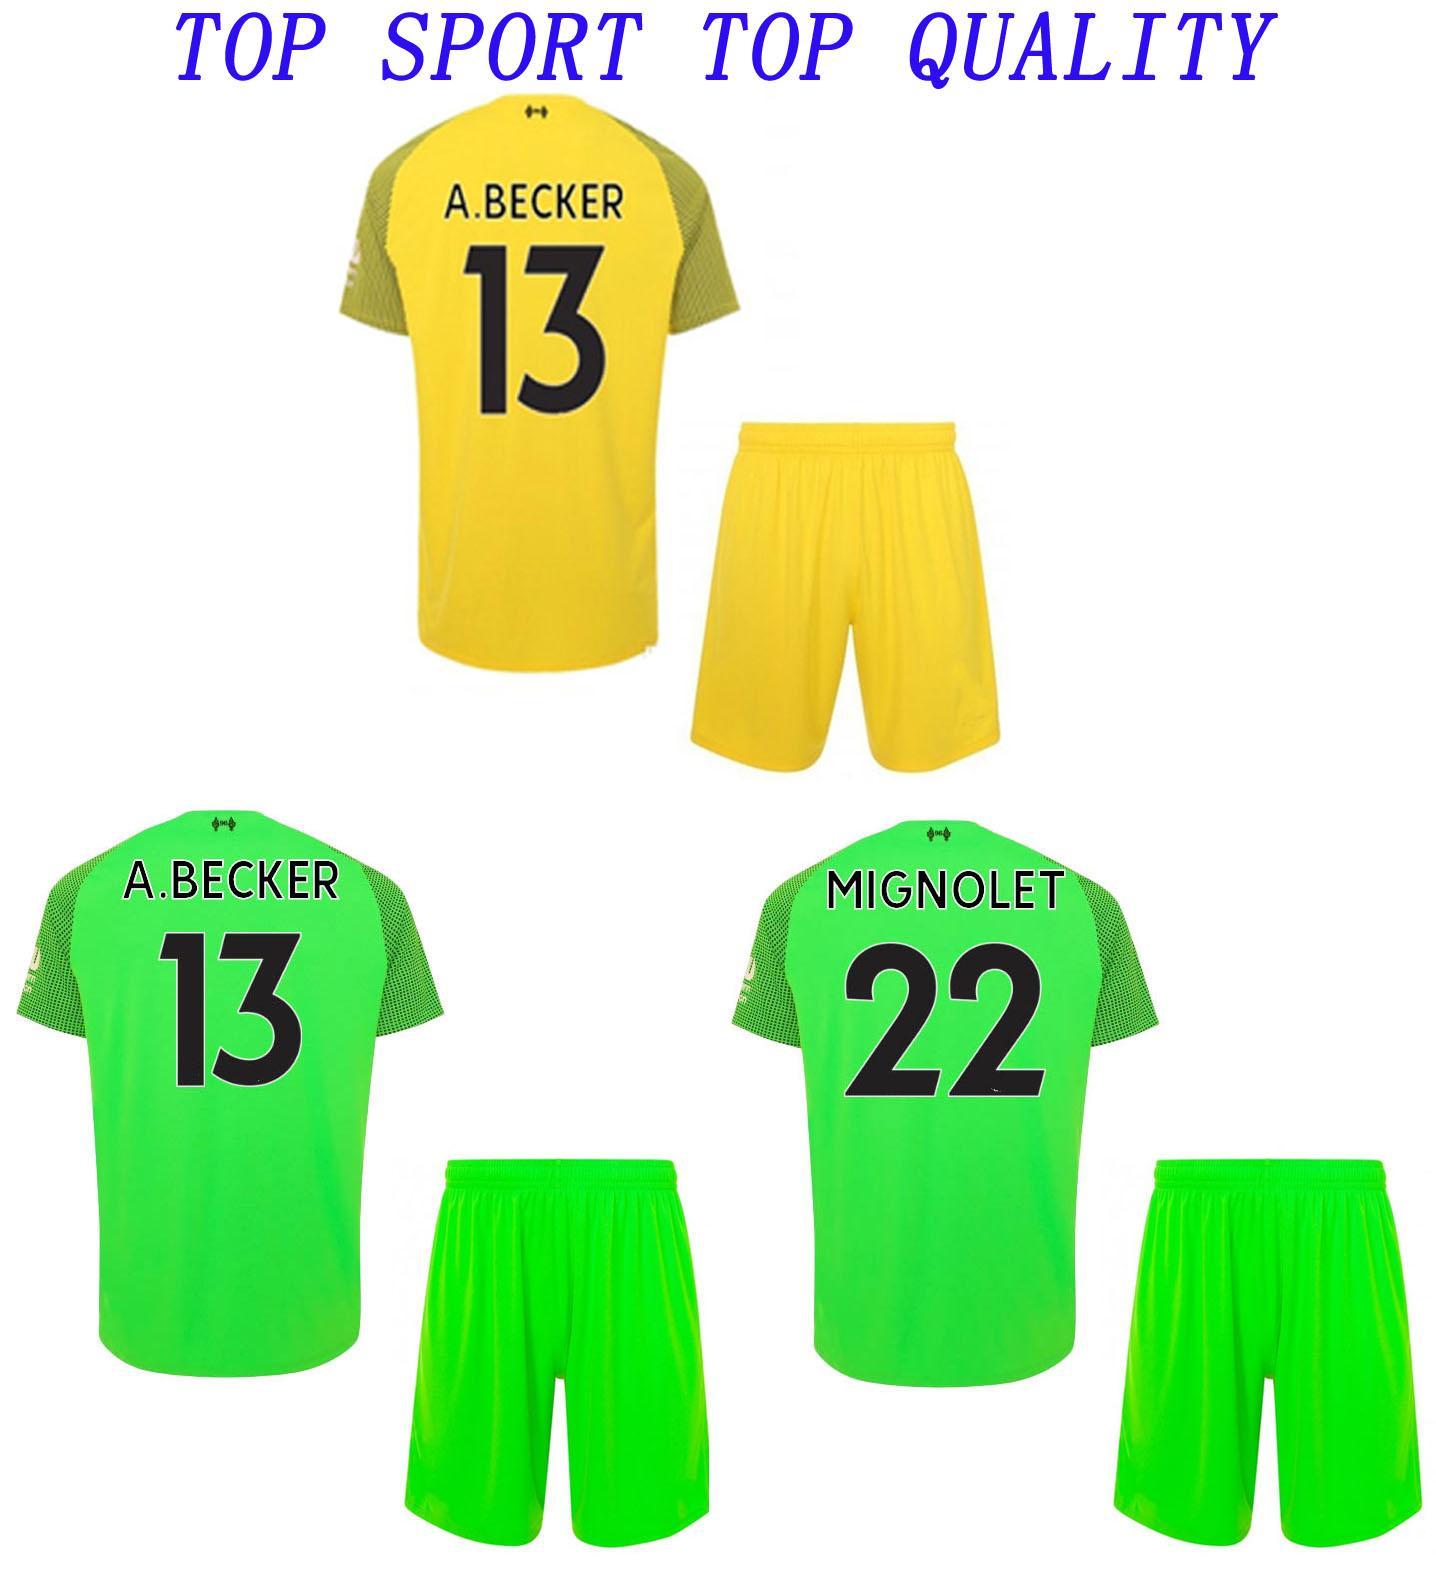 592b59cef40 2019 18 19 LIV Goalkeeper Soccer Jersey Shorts A.BECKER MIGNOLET Football  Sets 2018/19 Liv Goalie Shirts Pants Mens Outdoor Sport Training Suits From  ...